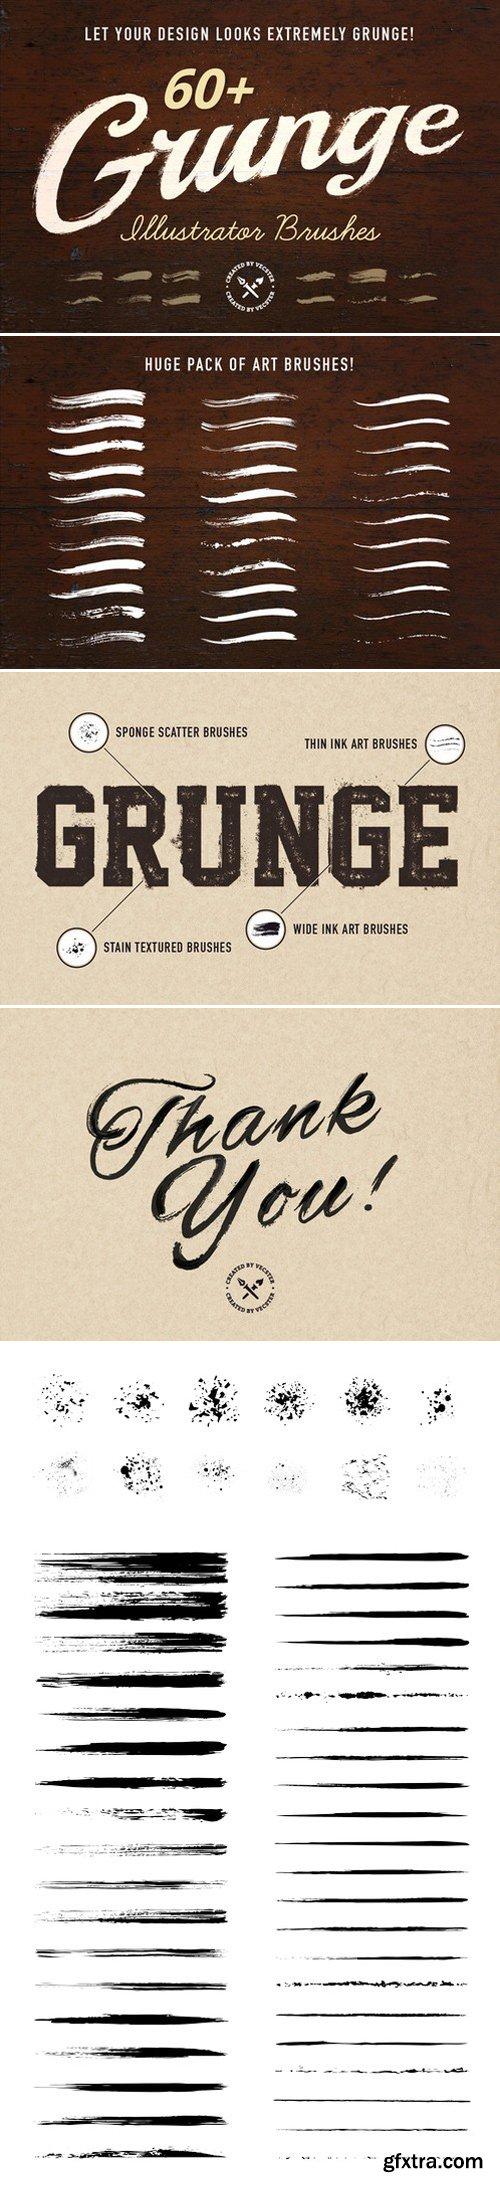 CM - 60+ Grunge Illustrator Brushes 398431